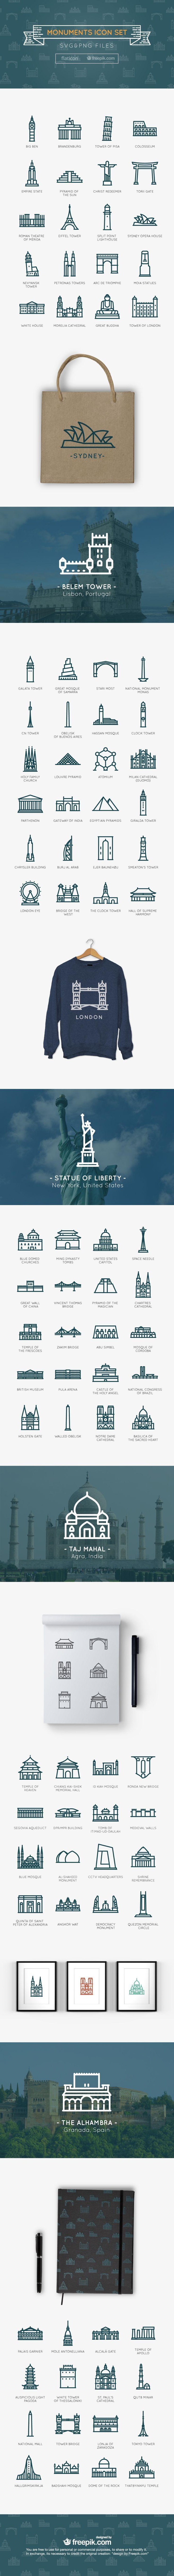 Free world monuments icons pack | Freepik Blog by Juanjo Fernández